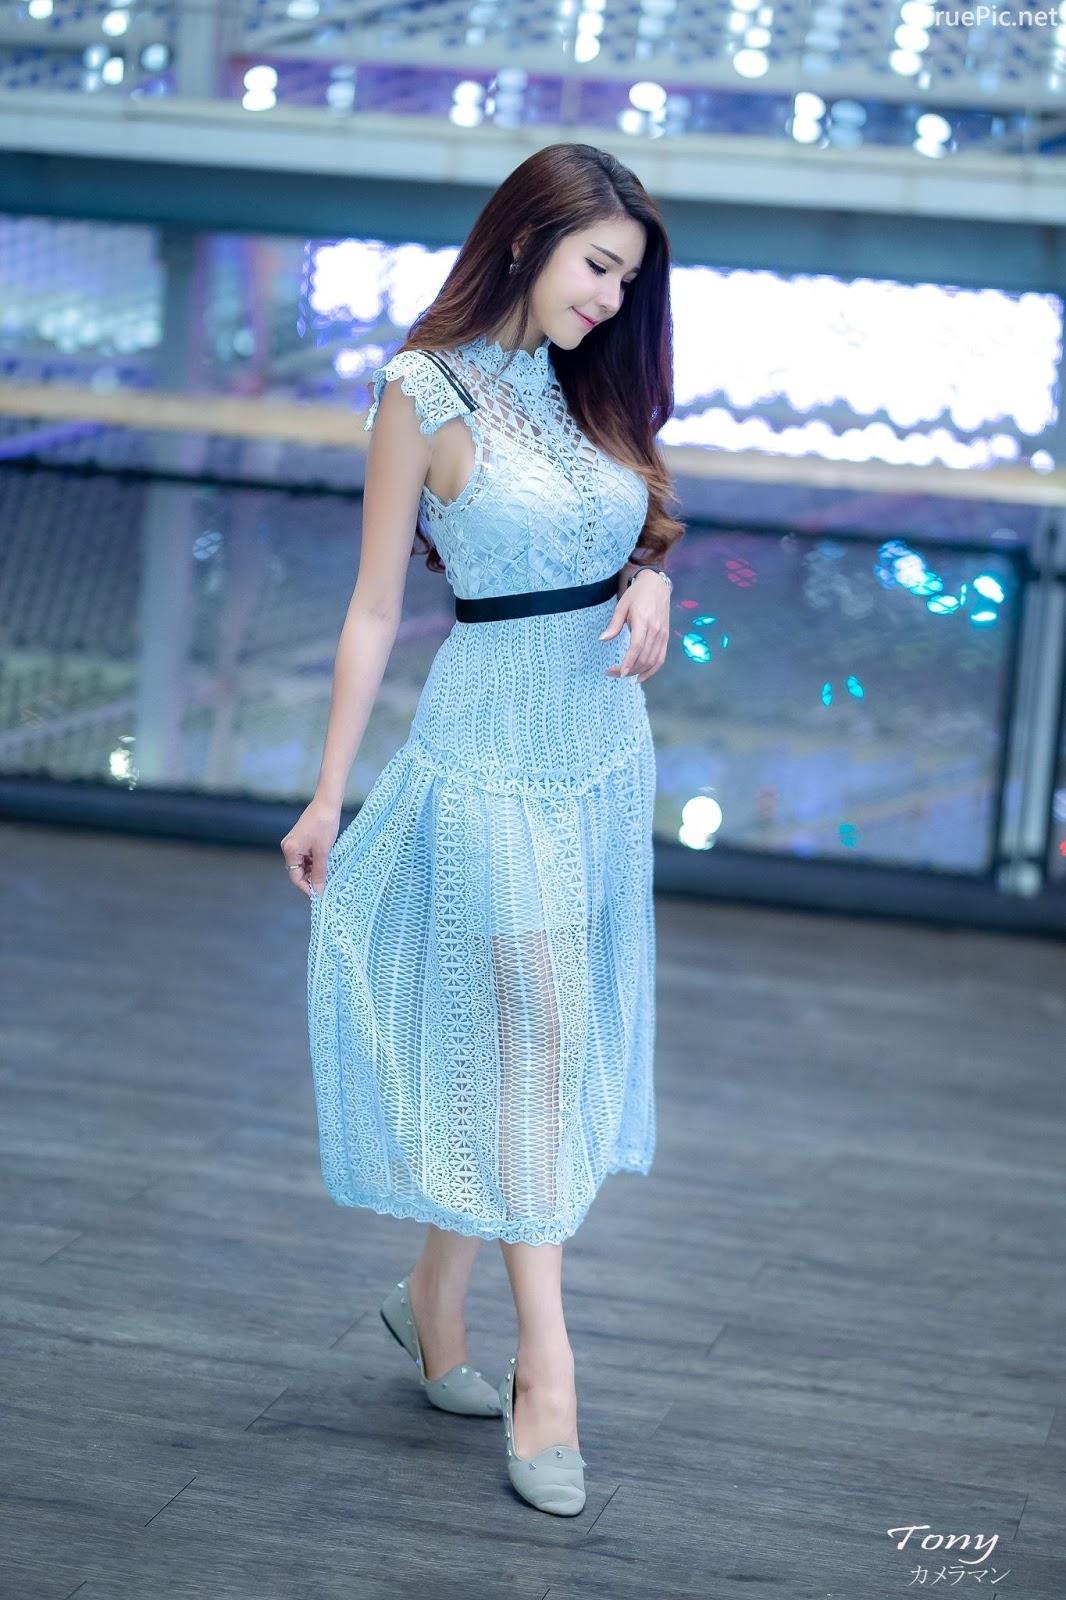 Thailand hot model – Janet Kanokwan Saesim – Sexy vs Cute and Bra vs Long Dress - Picture 5